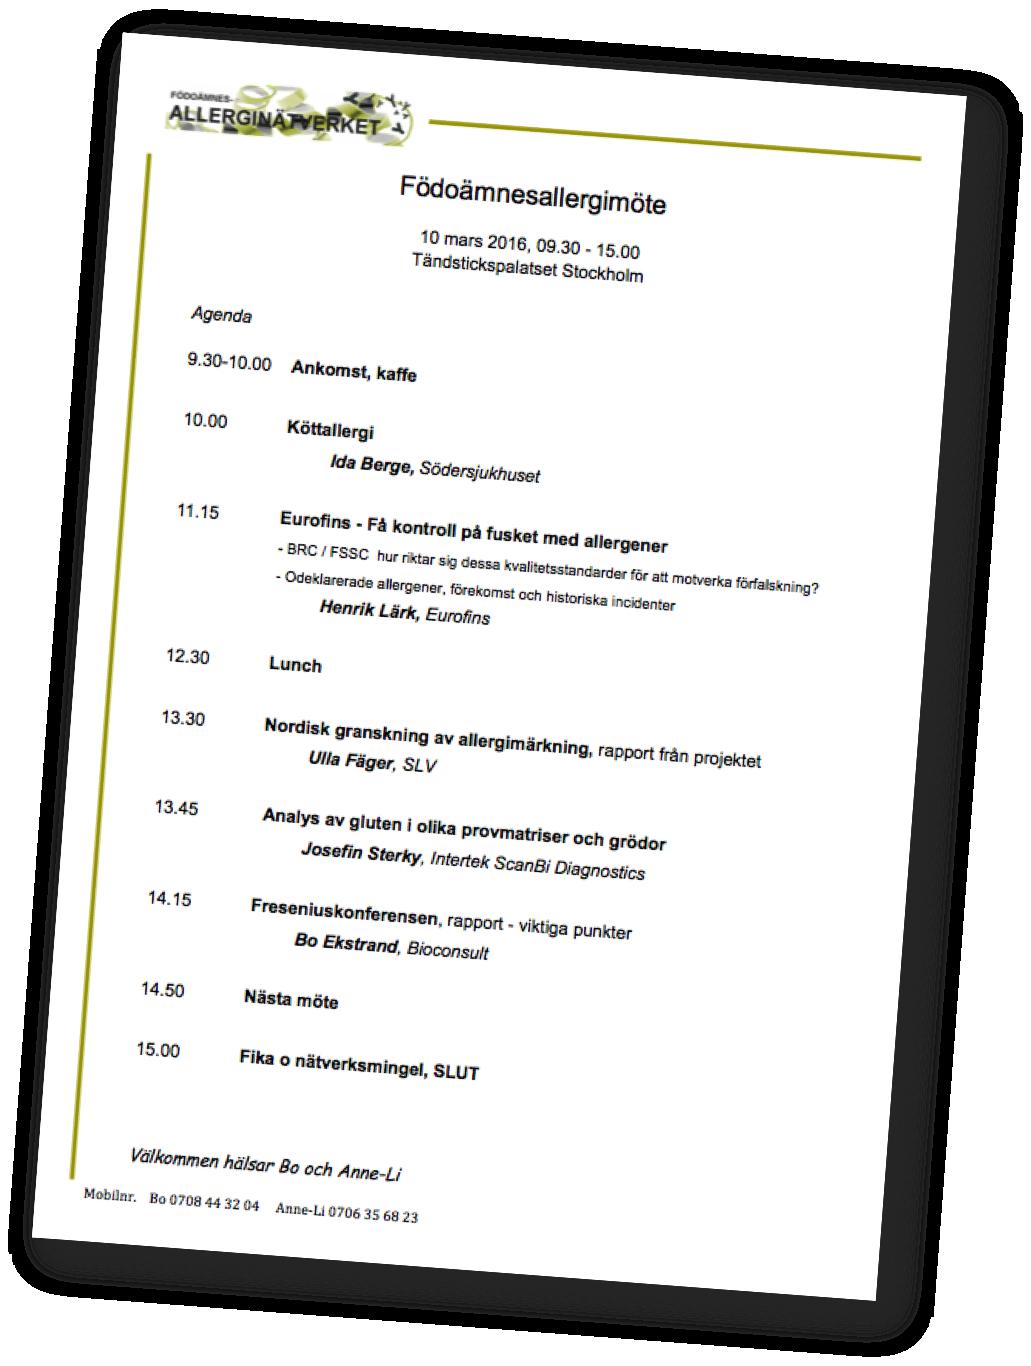 Agenda bild